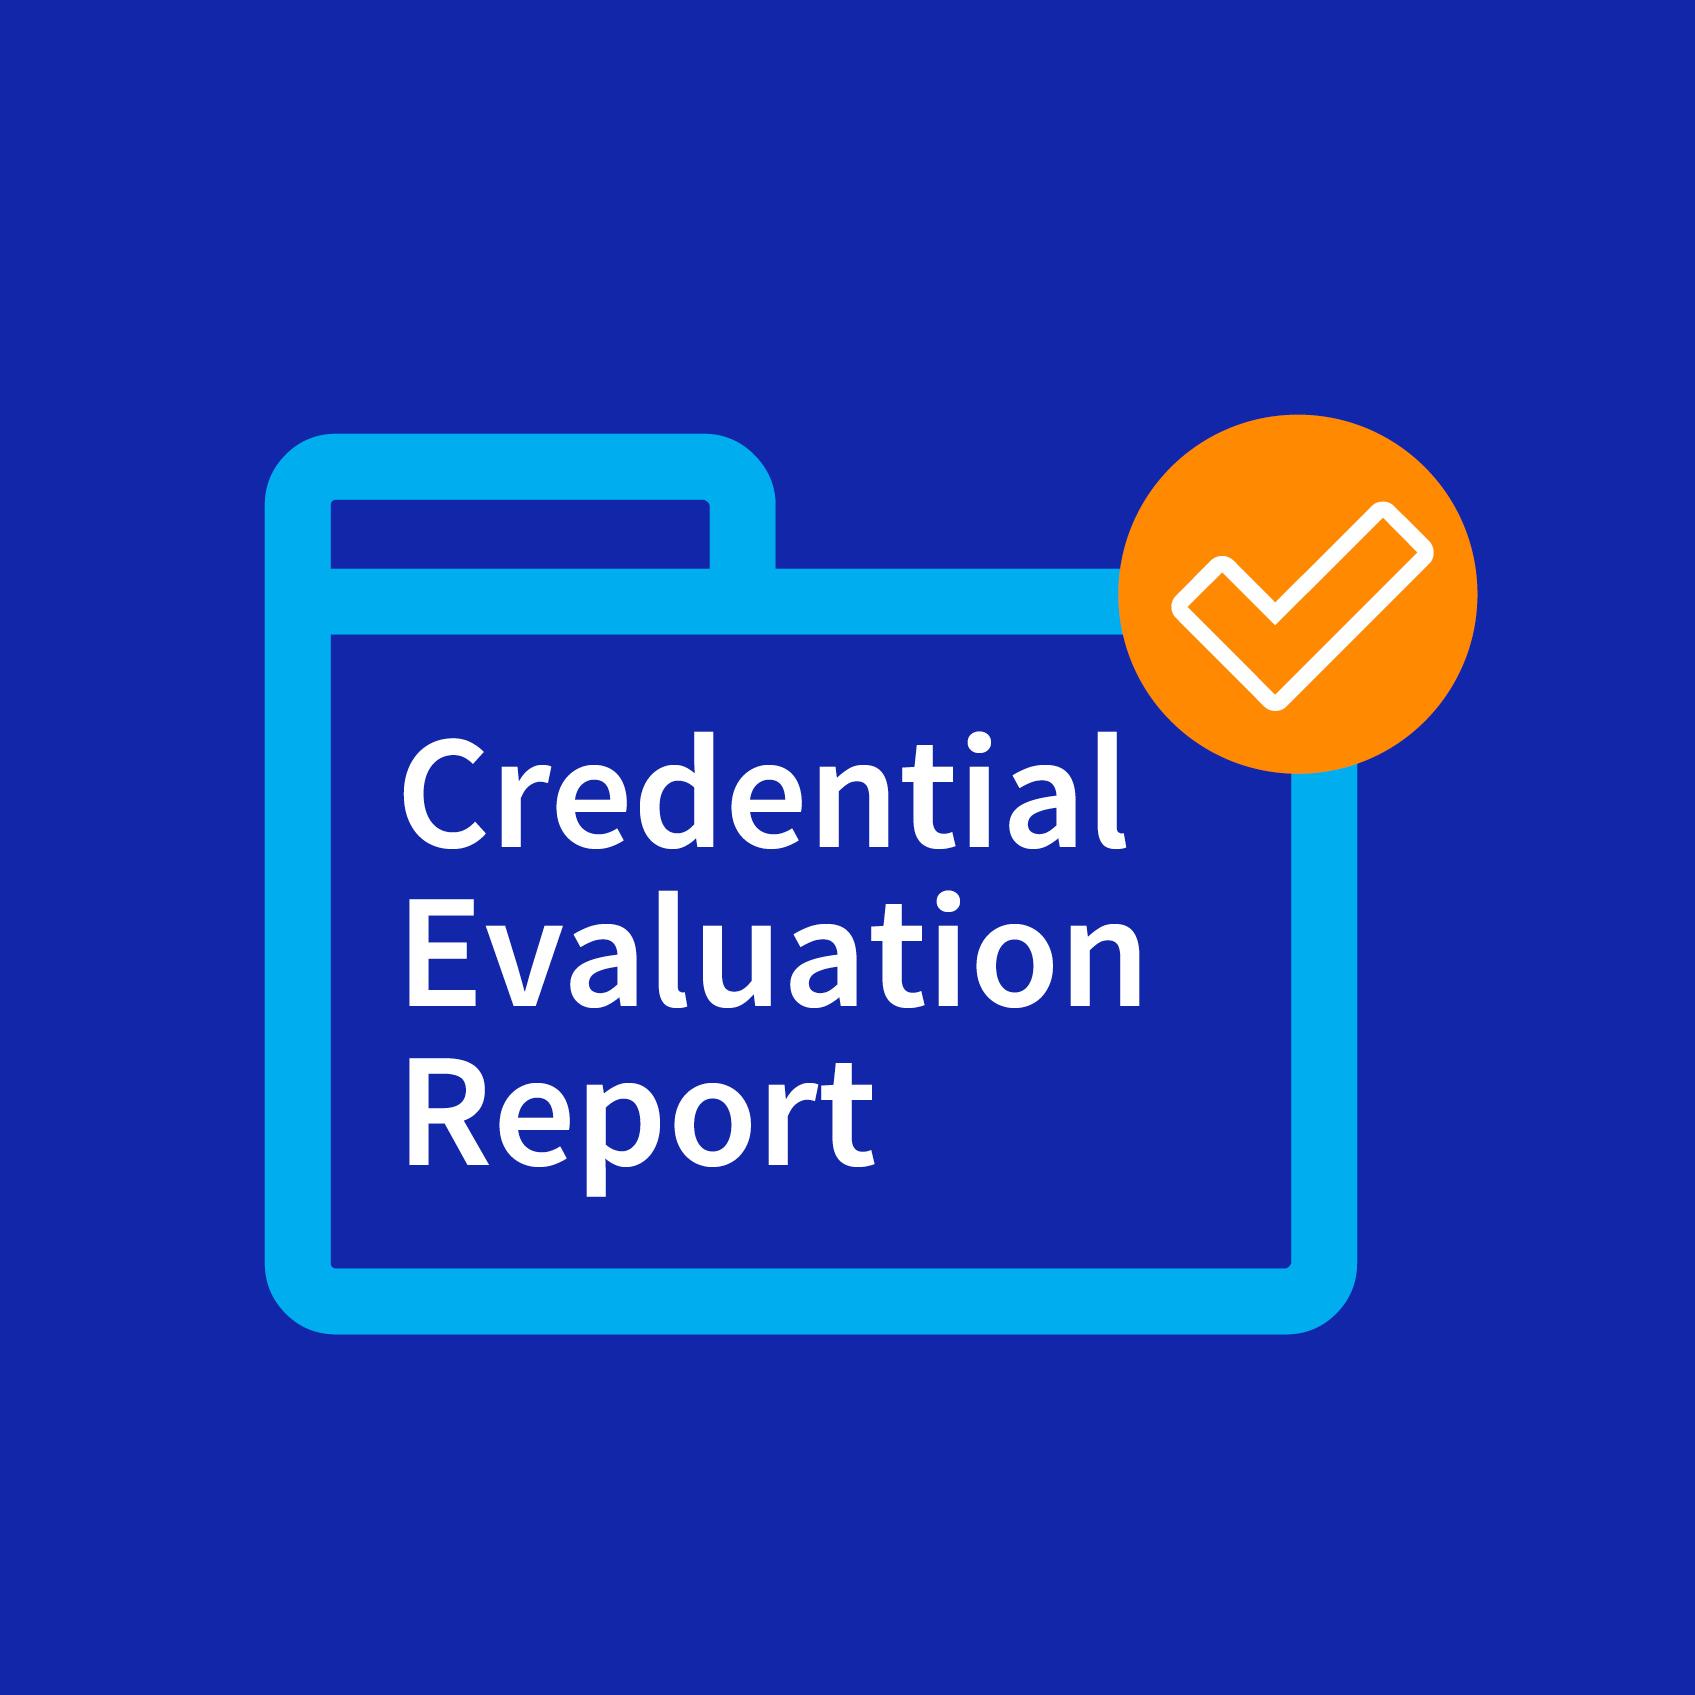 credential evaluation image